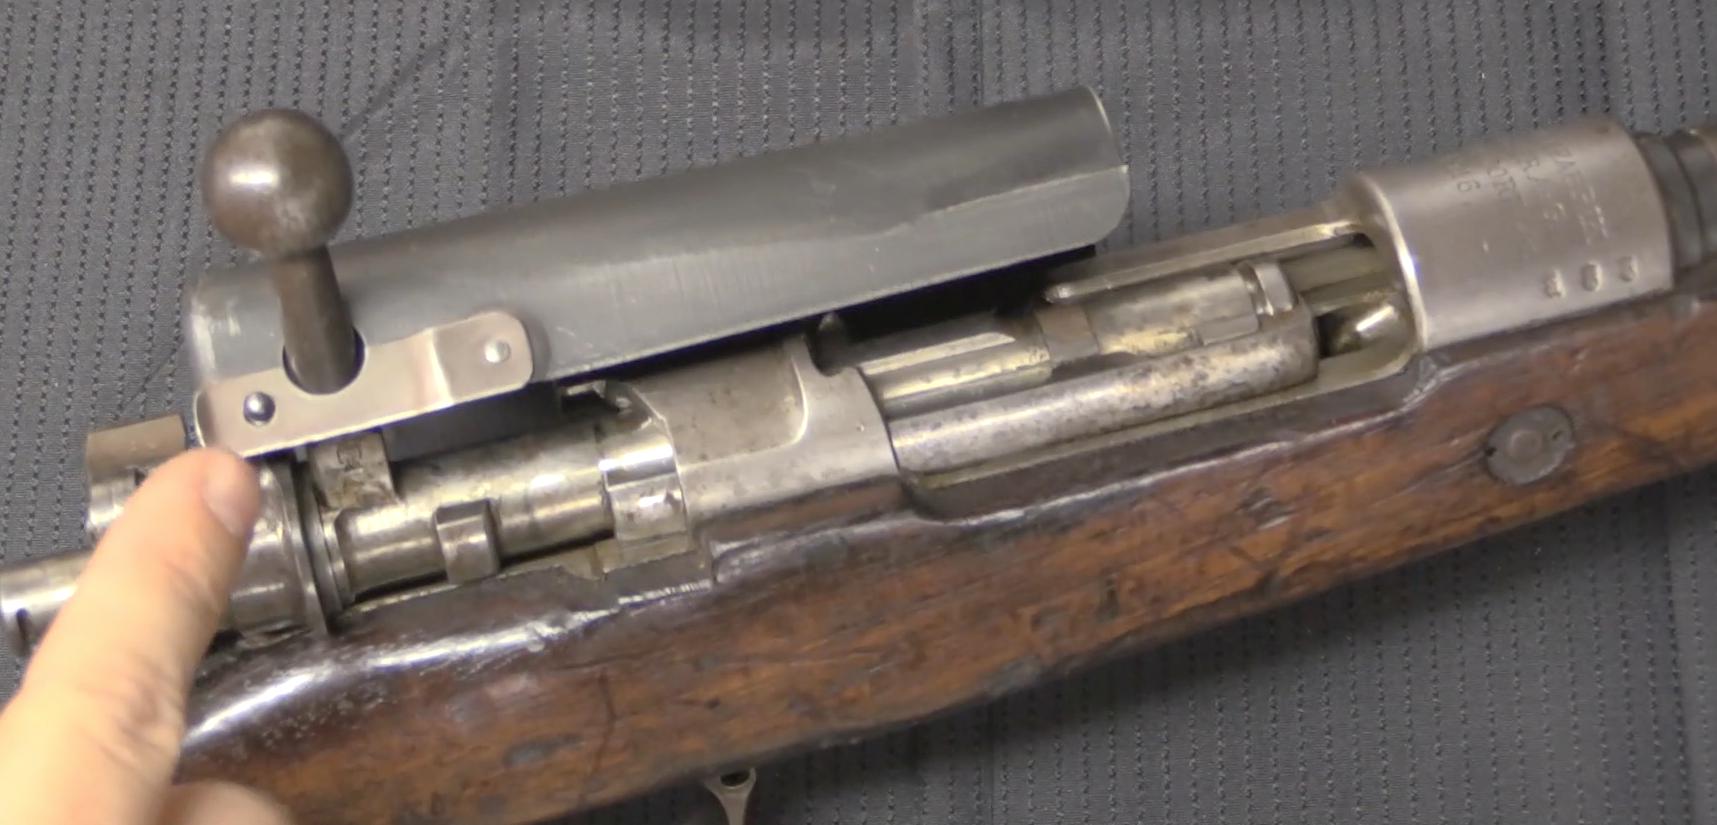 M1 Garand Ww1 WW1 Rifle Mud Covers: ...